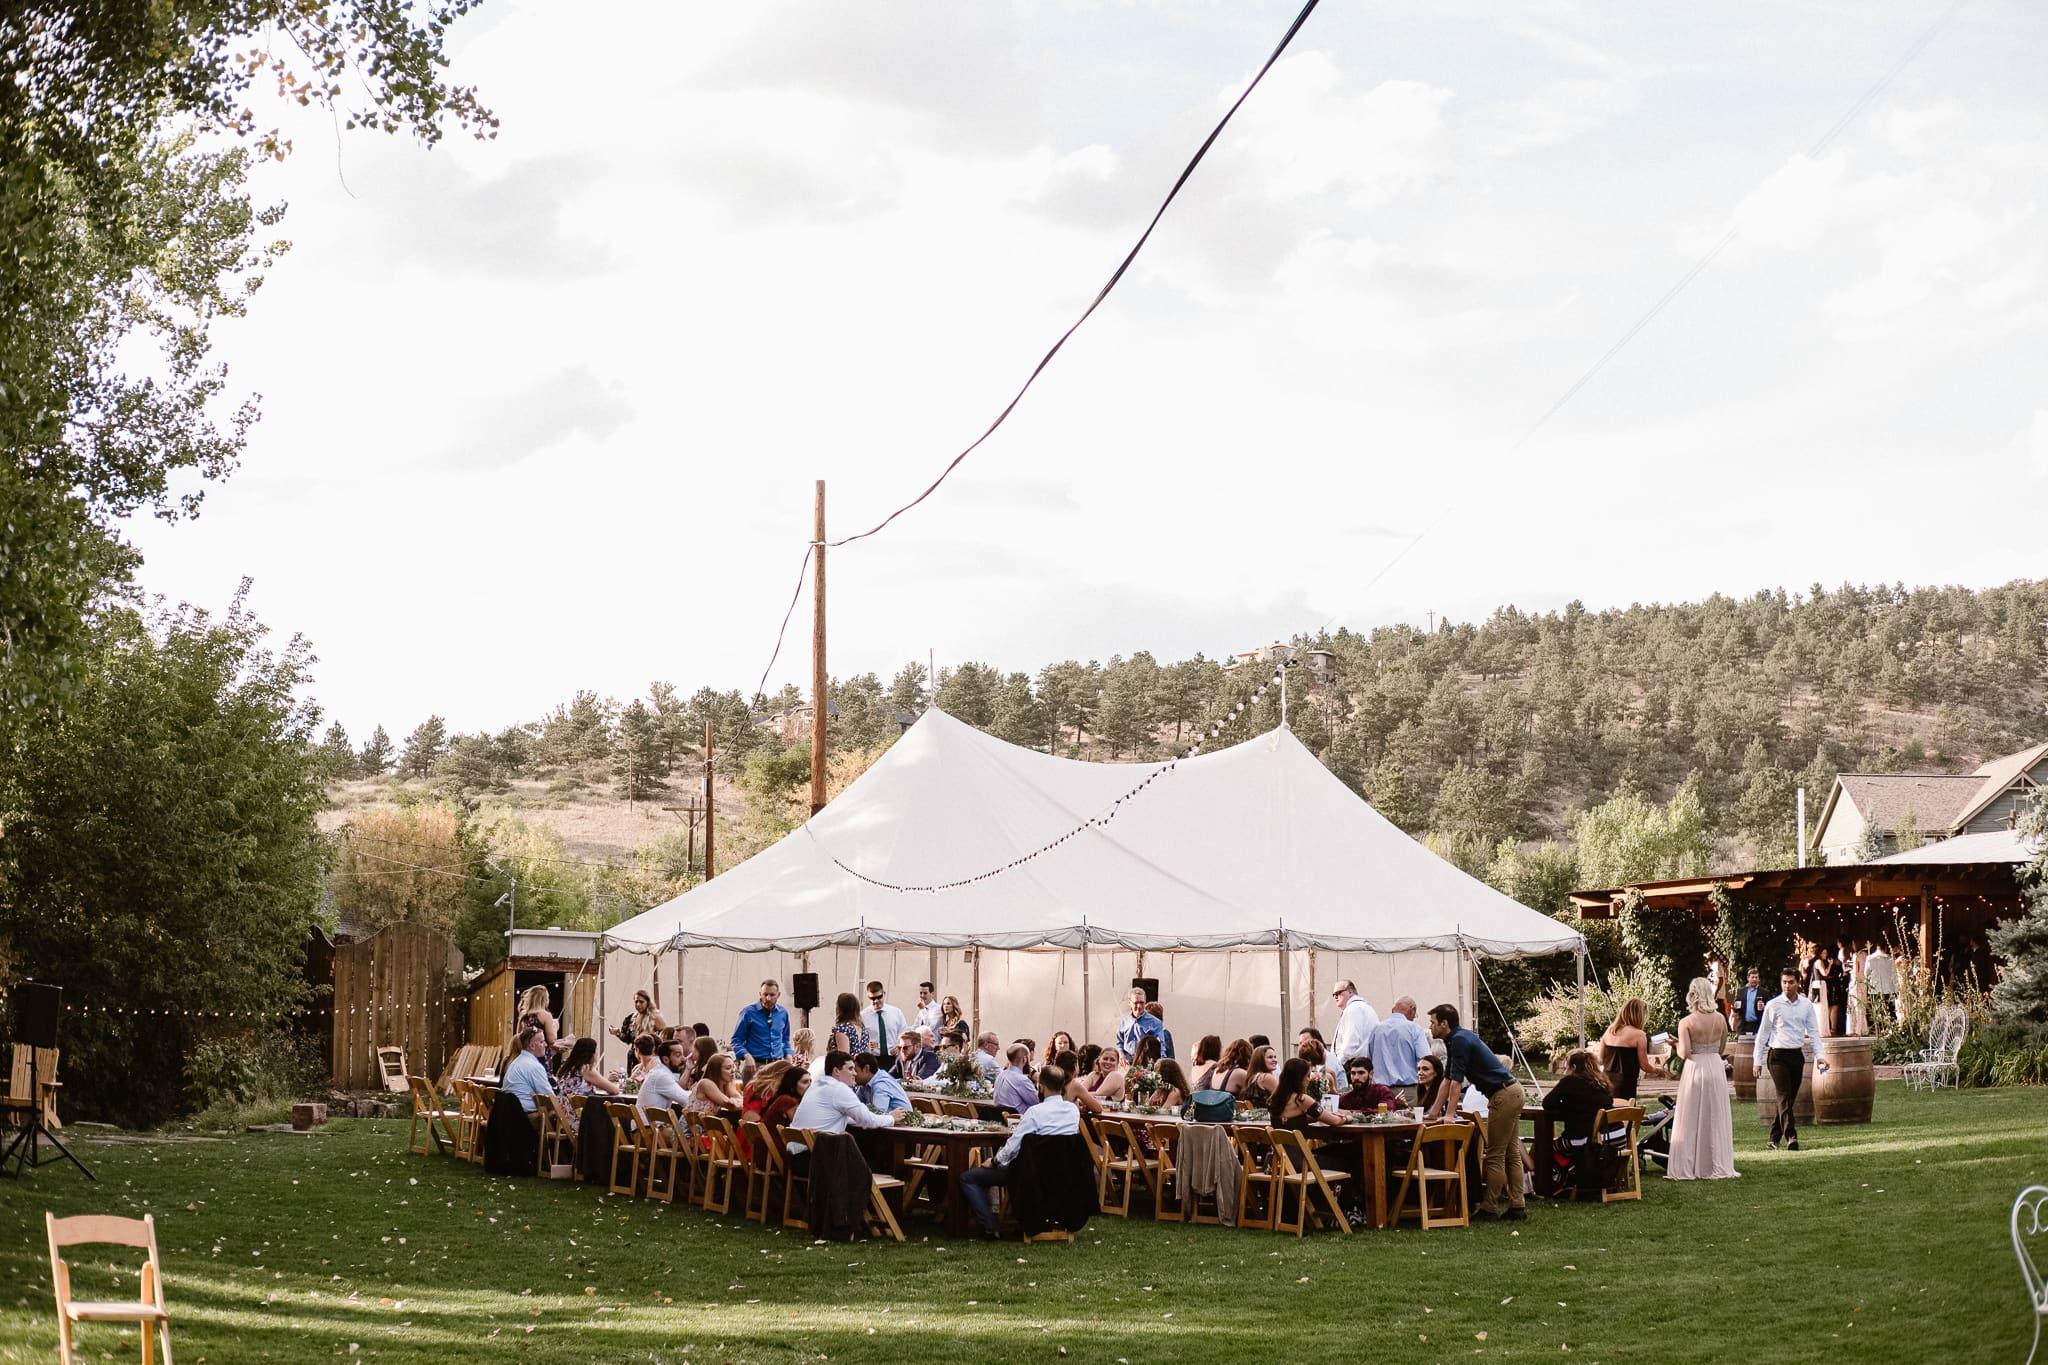 Lyons Farmette wedding photographer, Colorado intimate wedding photographer, cocktail hour photos,